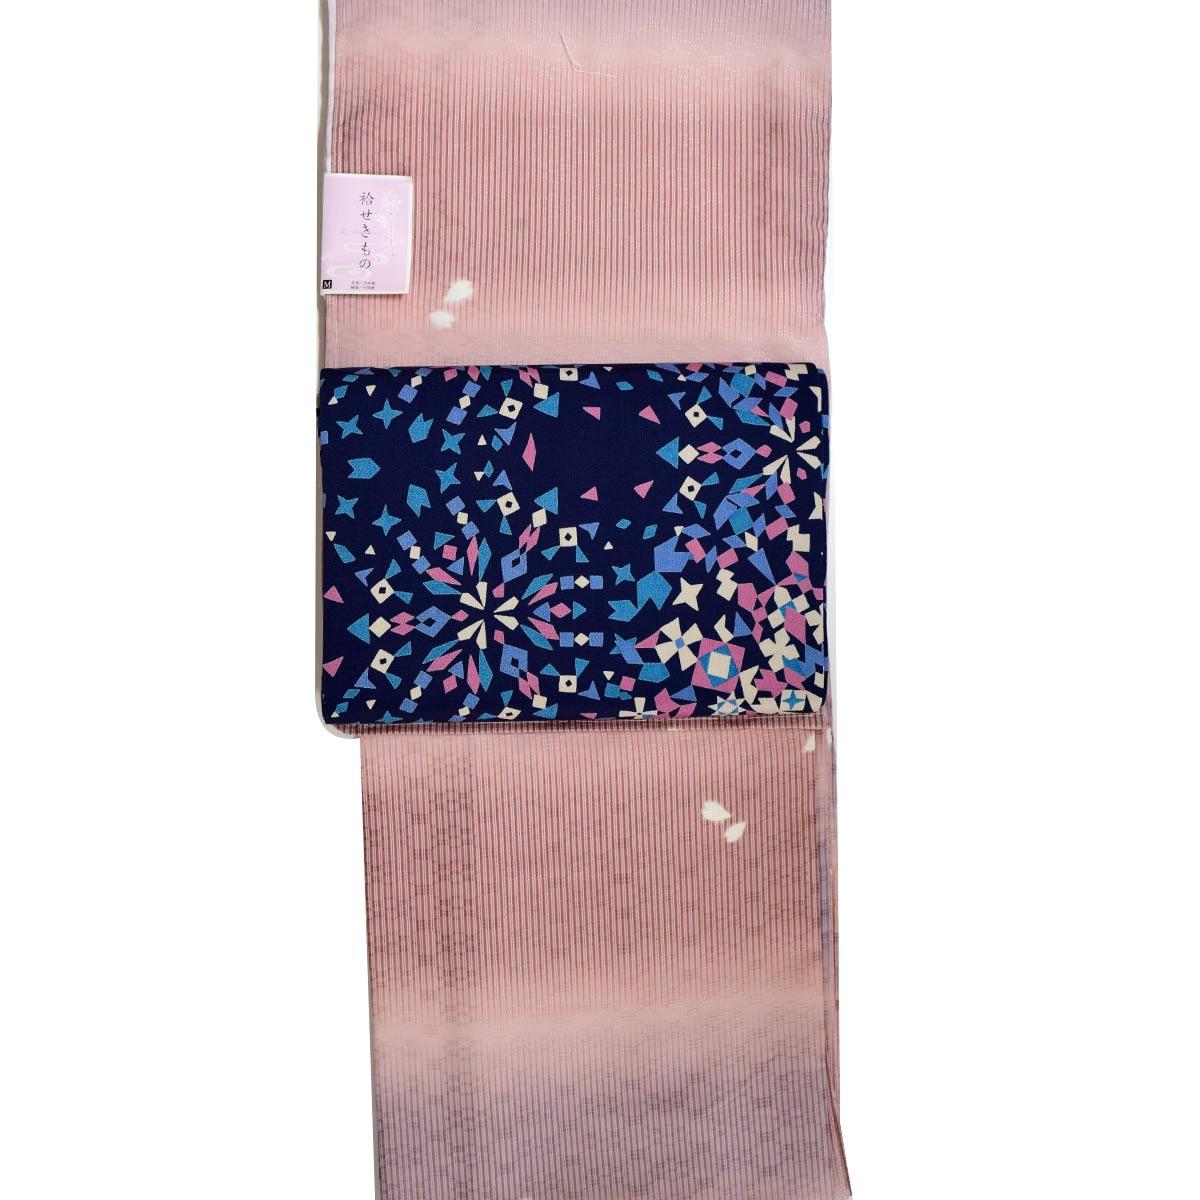 【M寸】洗える 袷 着物セット【2点】洗える袷着物+正絹九寸名古屋帯番号d910-12 着物 和装 和服